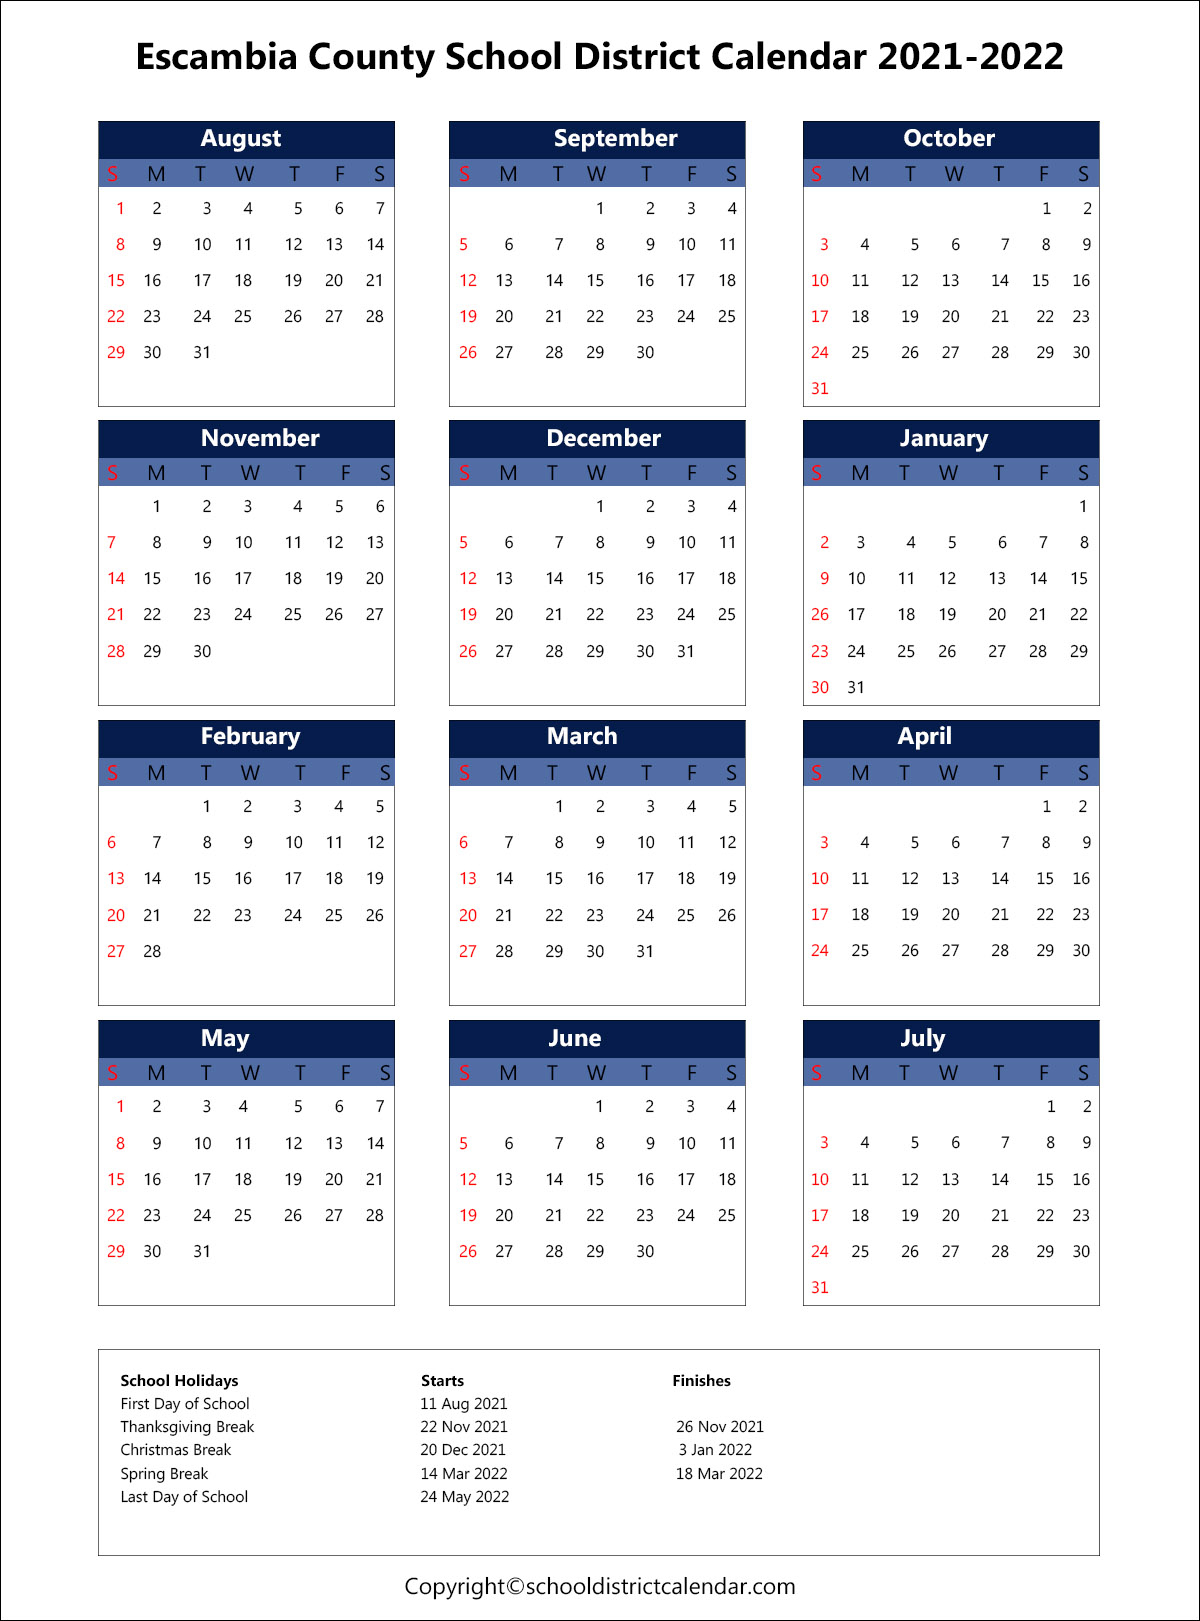 Escambia County School District Calendar Holidays 2021-2022 regarding 2021 2022 Aiken County Public School Calendar